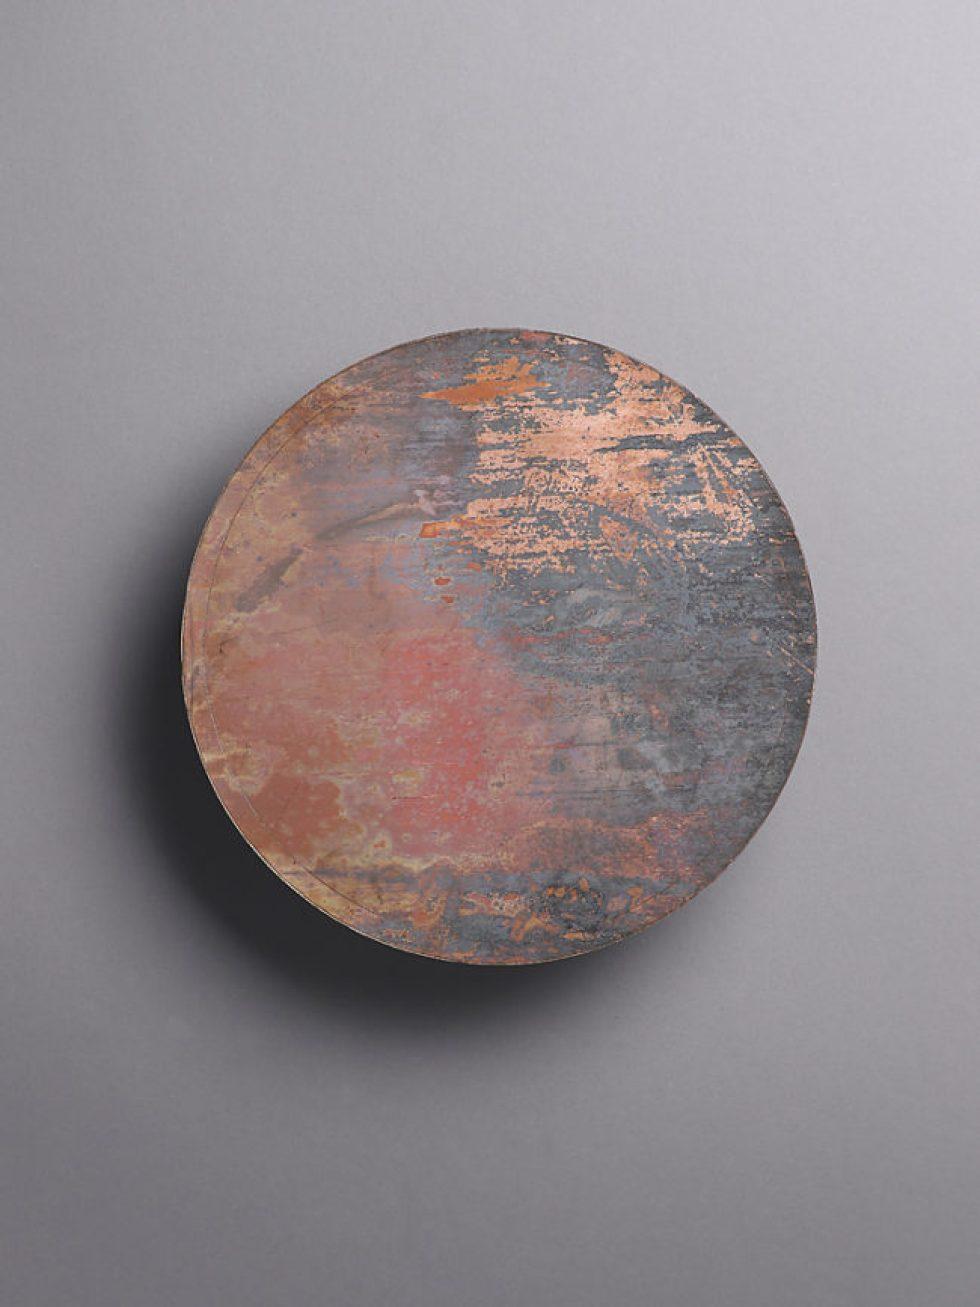 Copper crafting